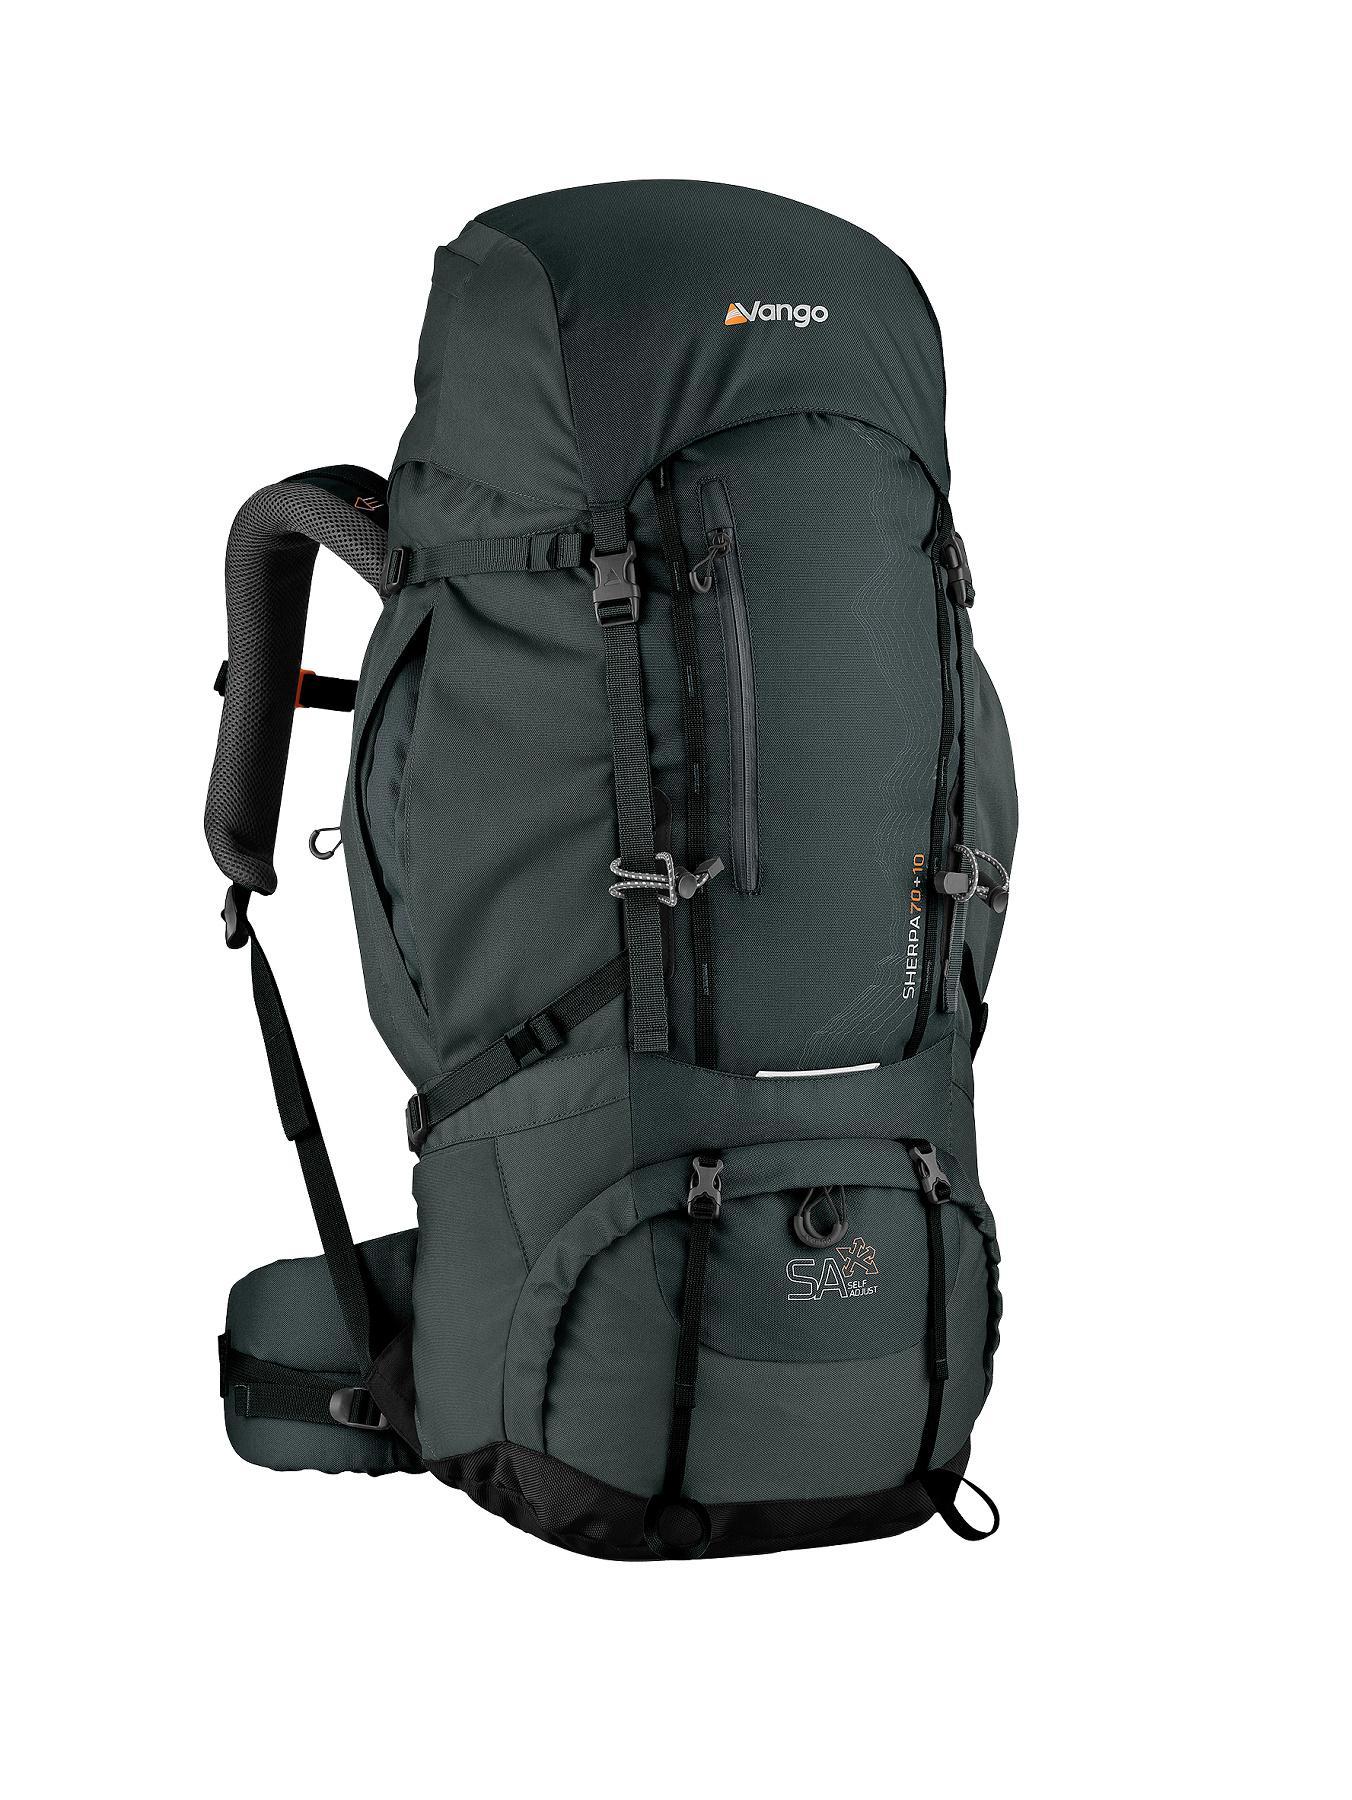 Vango Sherpa 70 + 10-Litre Rucksack